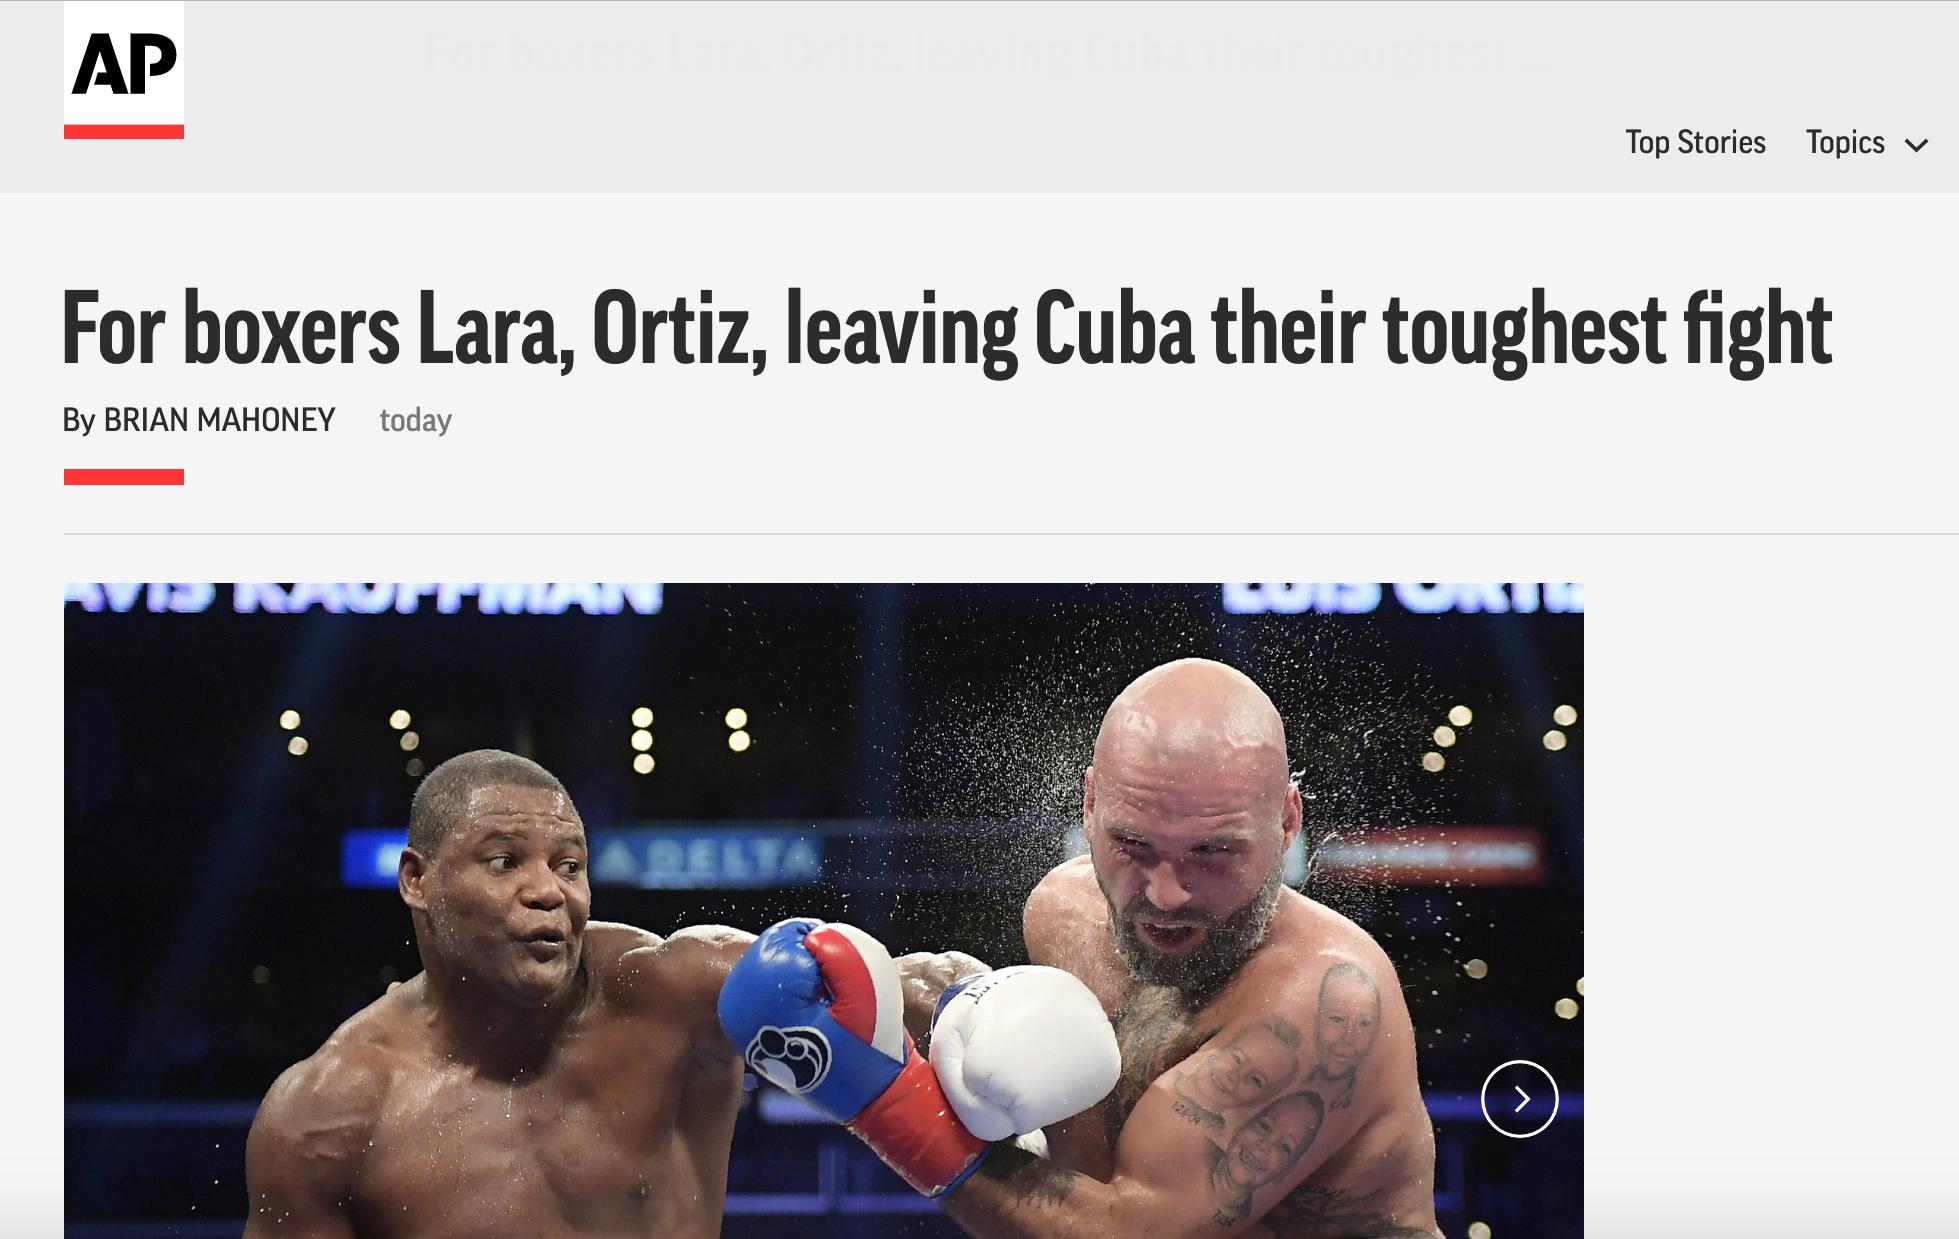 AP SPEAKS WITH ERISLANDY LARA AND LUIS ORTIZ ON LIFE AFTER CUBA